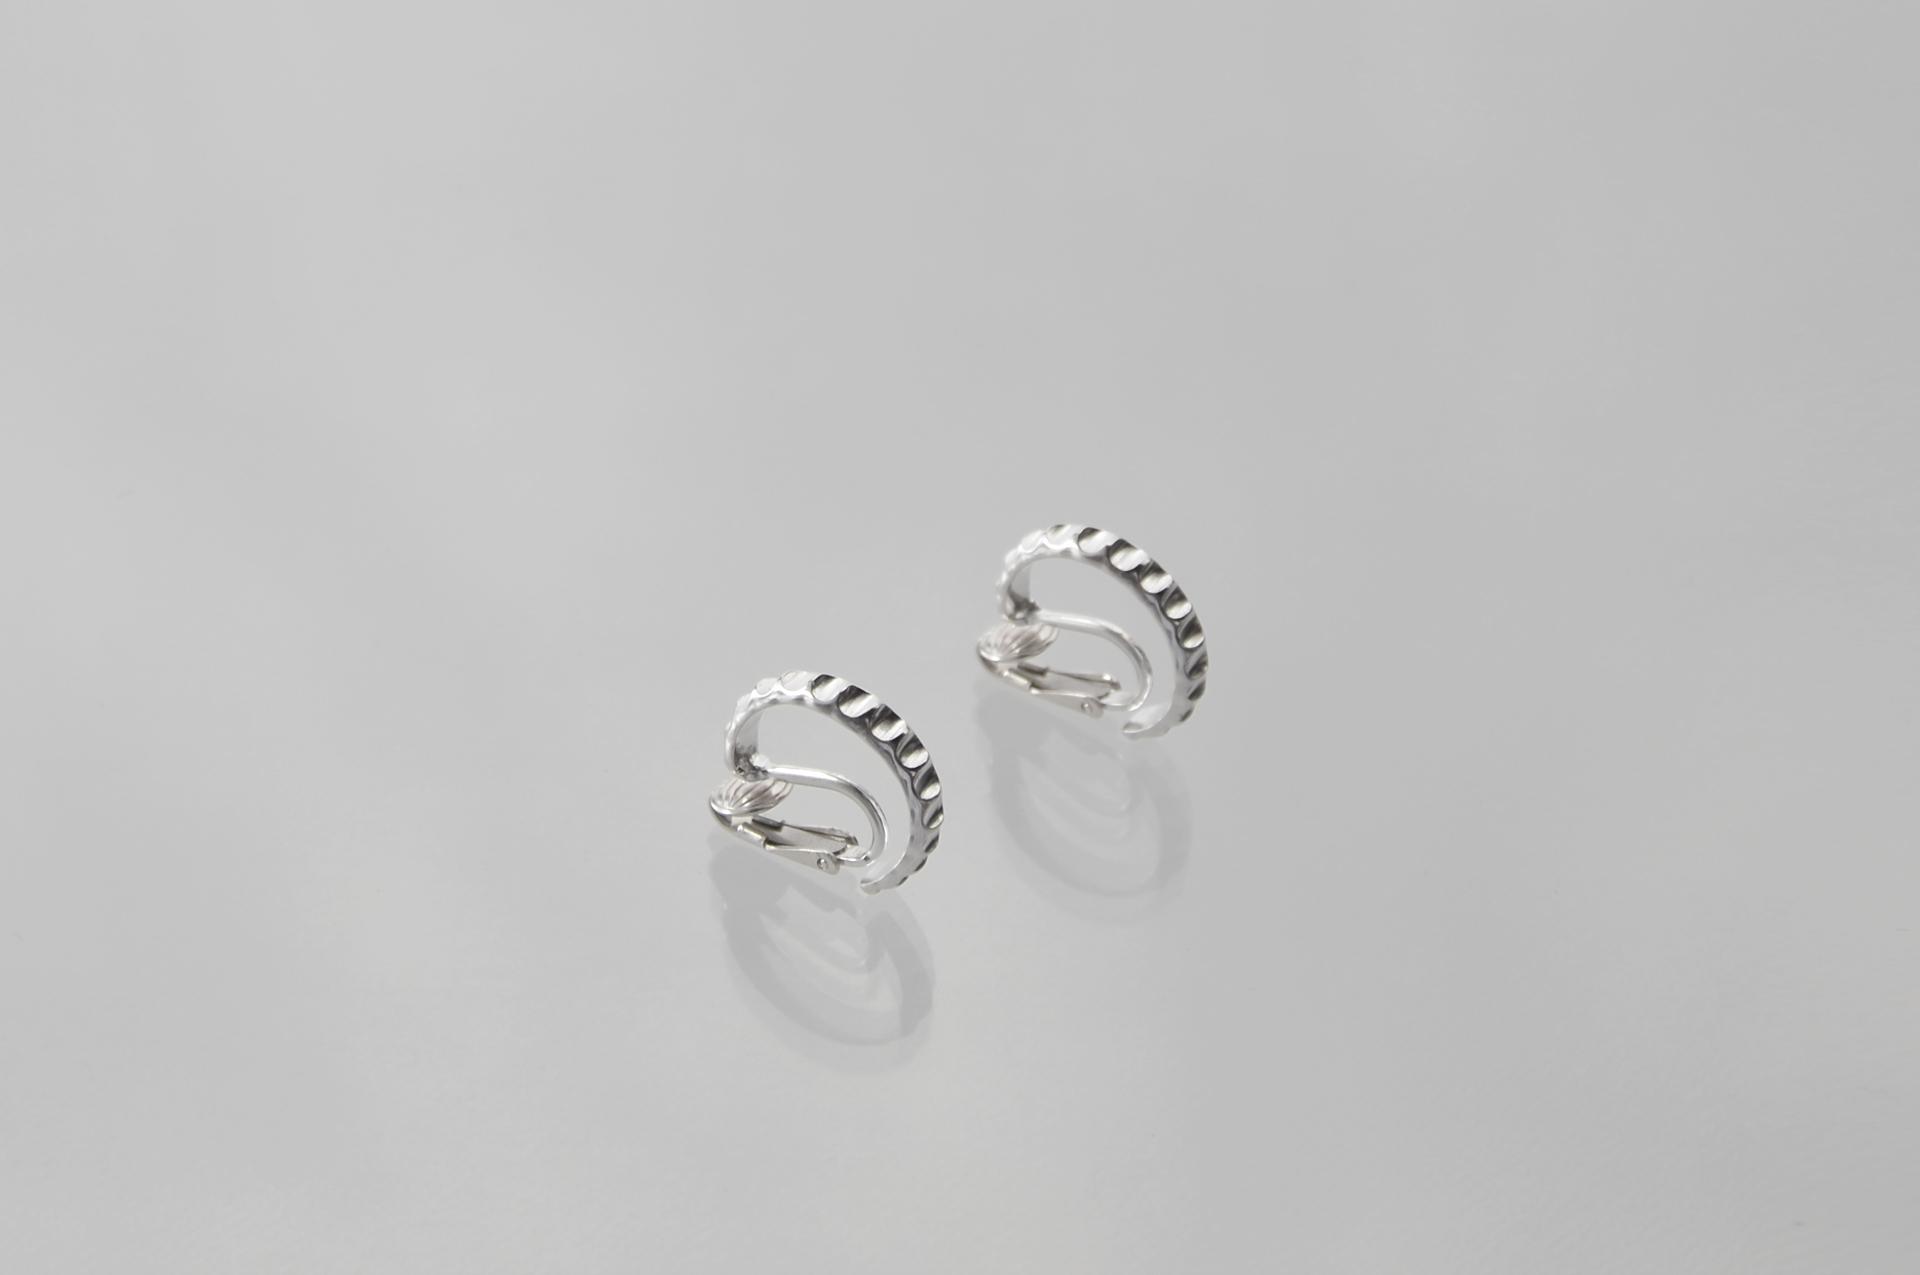 corona-earrings_jan2018